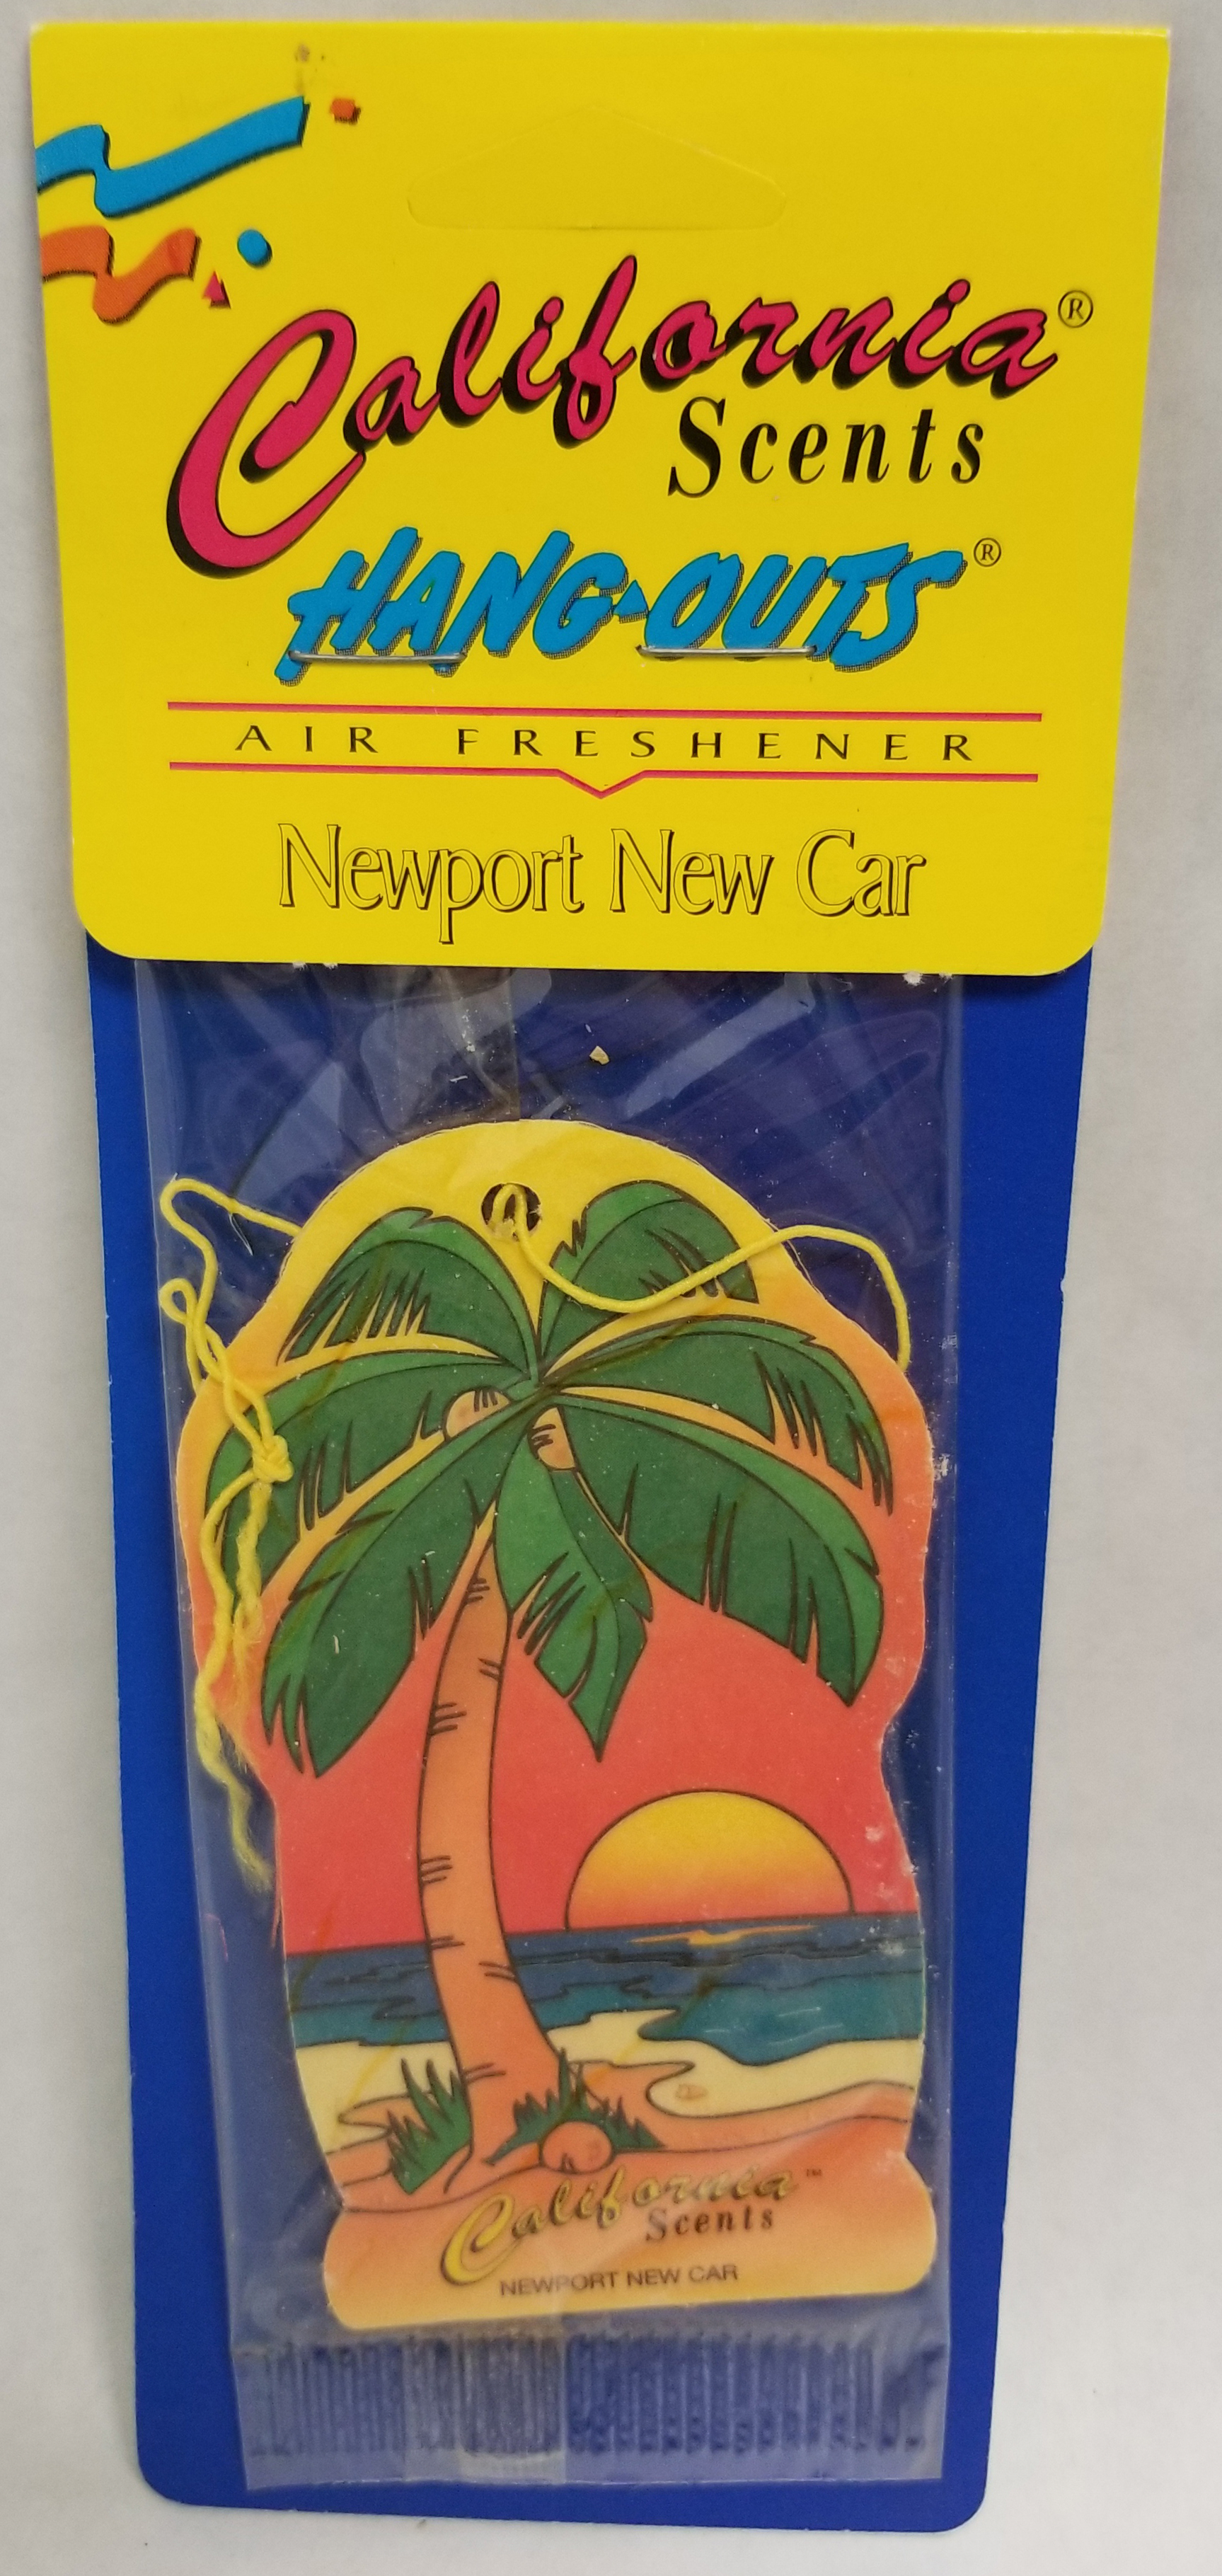 03096 - California Newport New Car Air Freshener